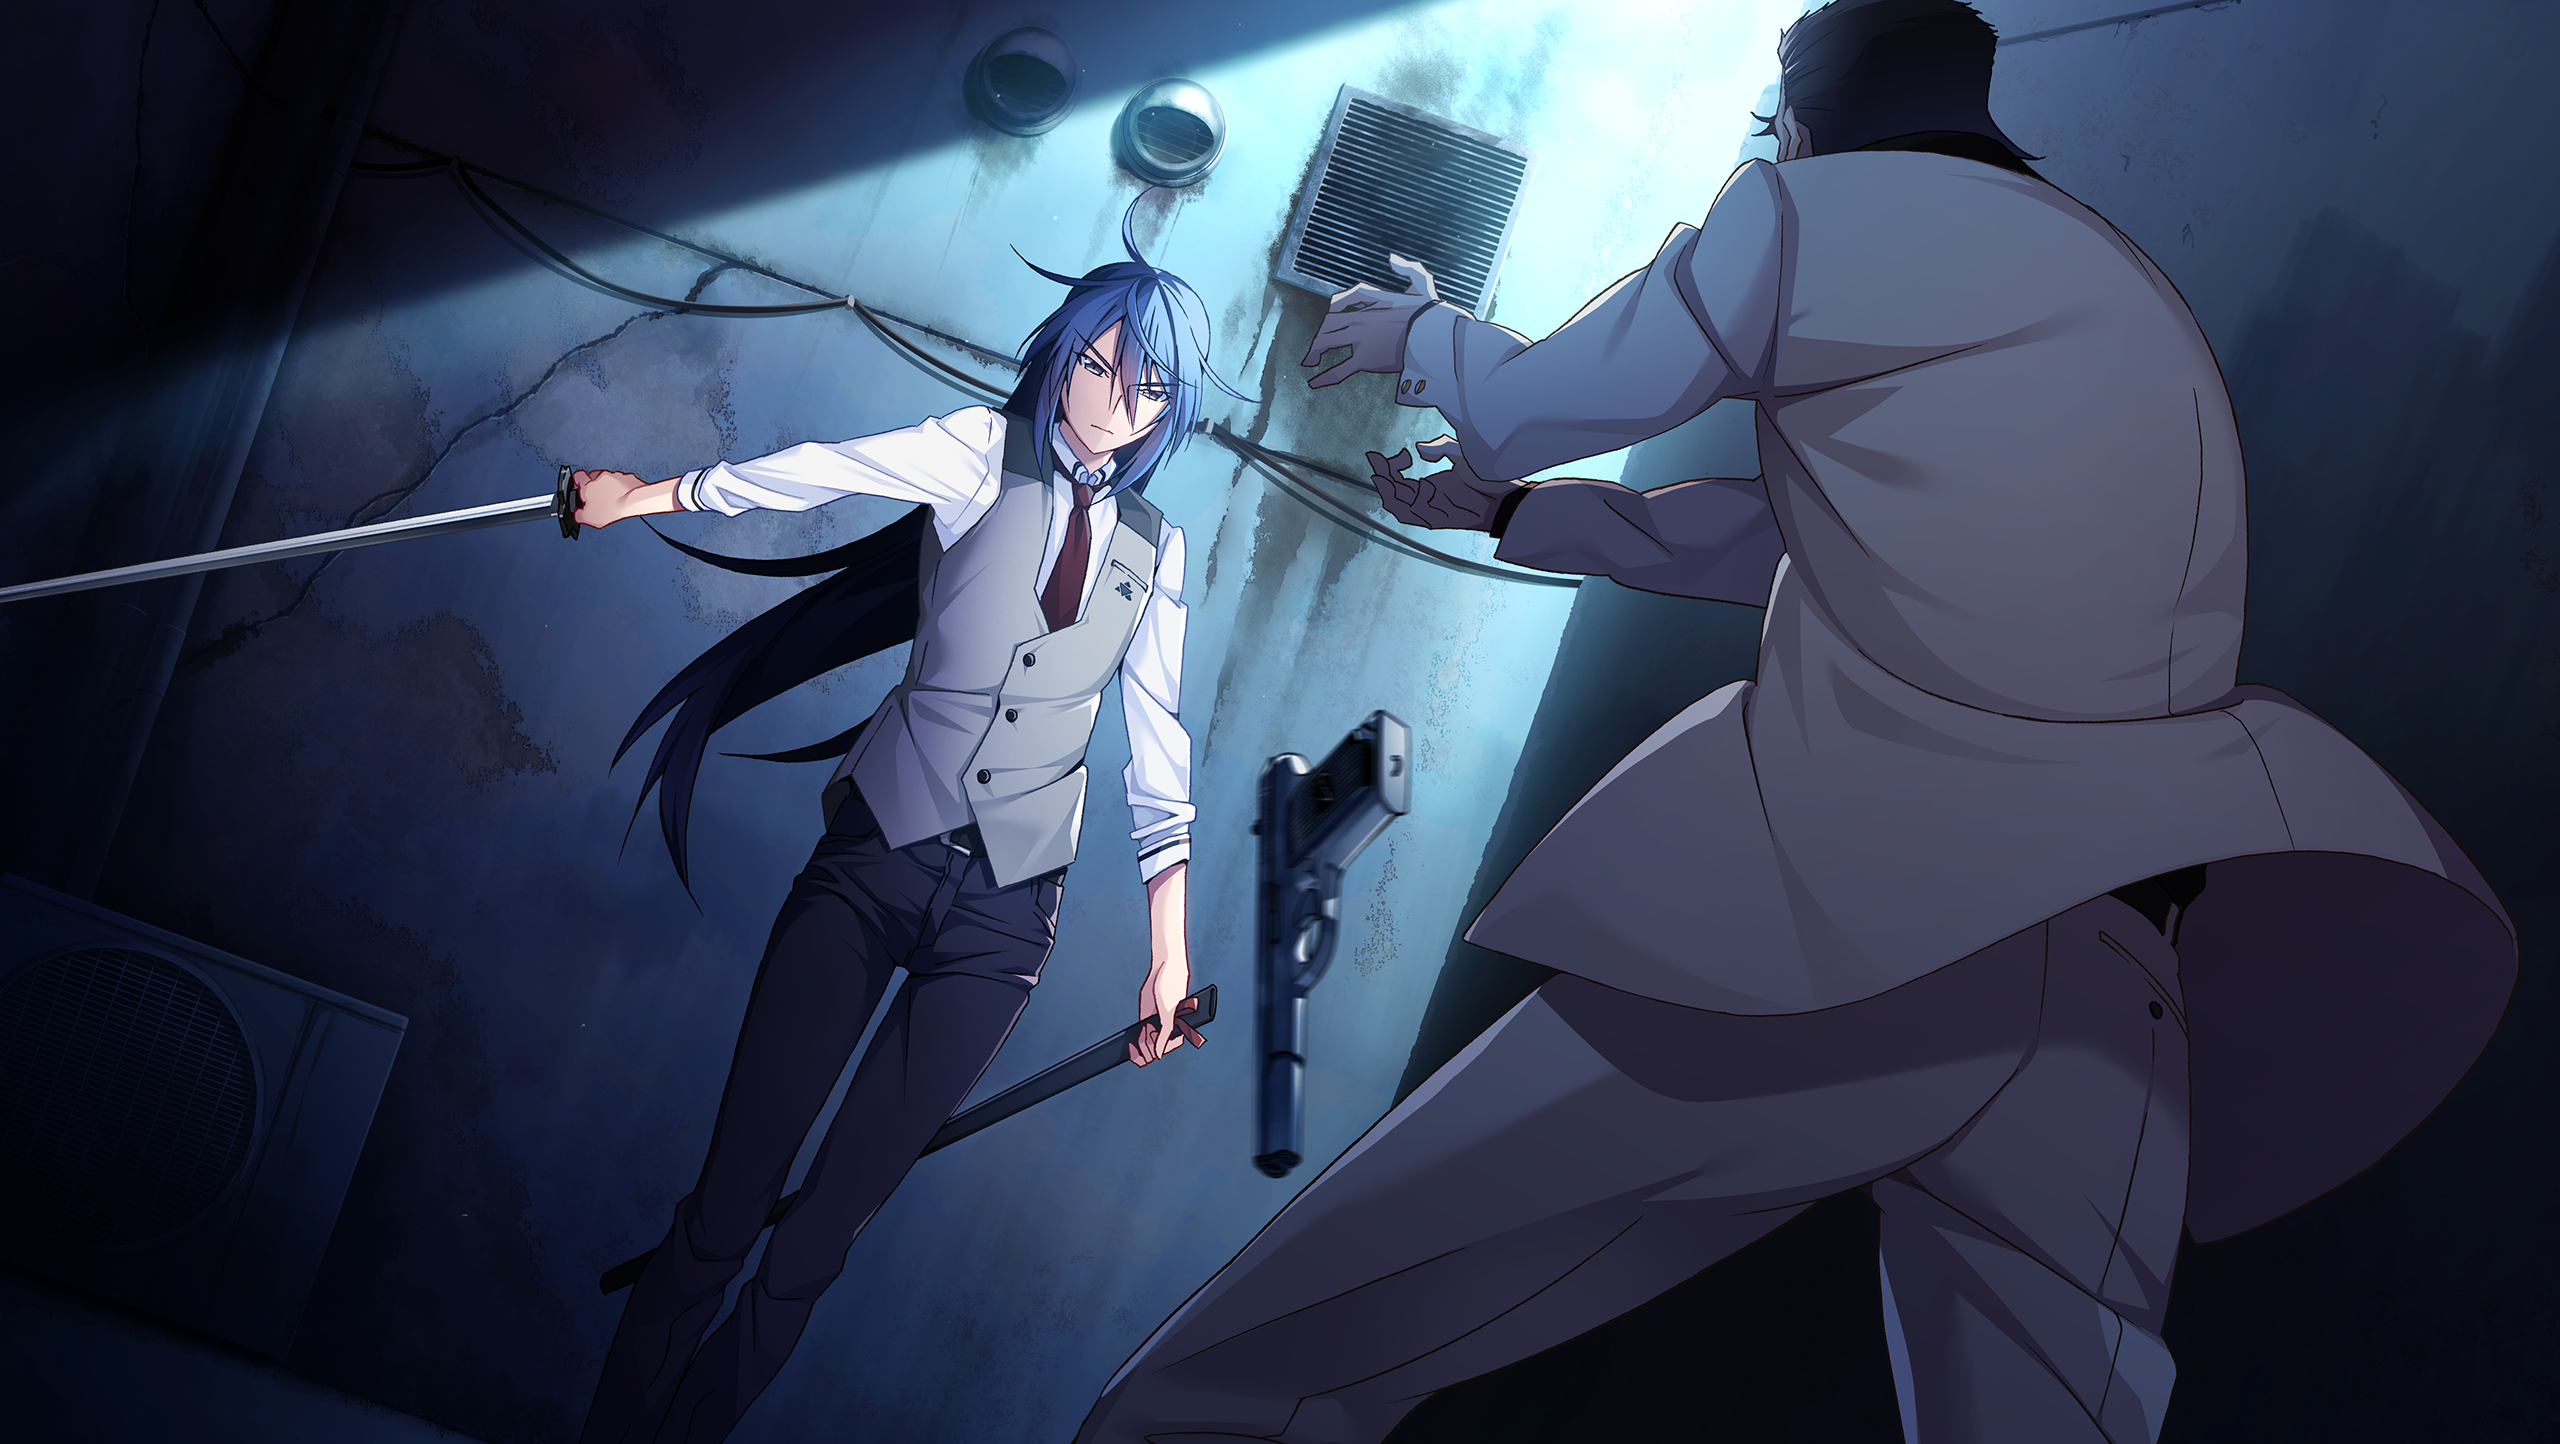 Trigger Anime Characters : Grisaia phantom trigger zerochan anime image board